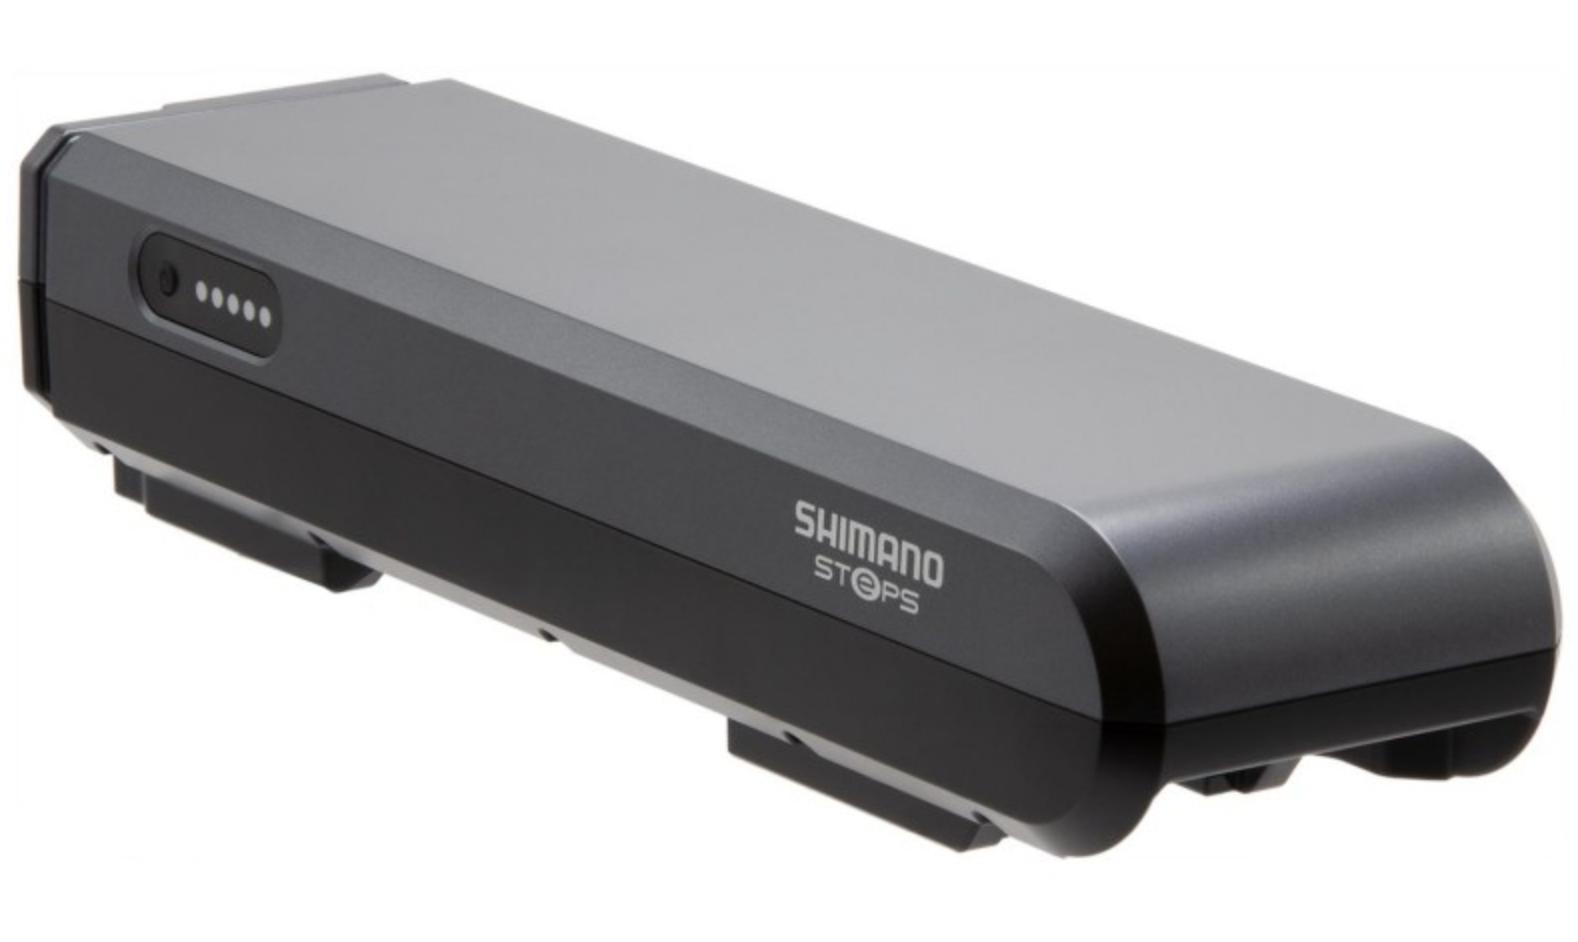 Elektrische fiets accu revisie Shimano Steps BT-E6000 36V